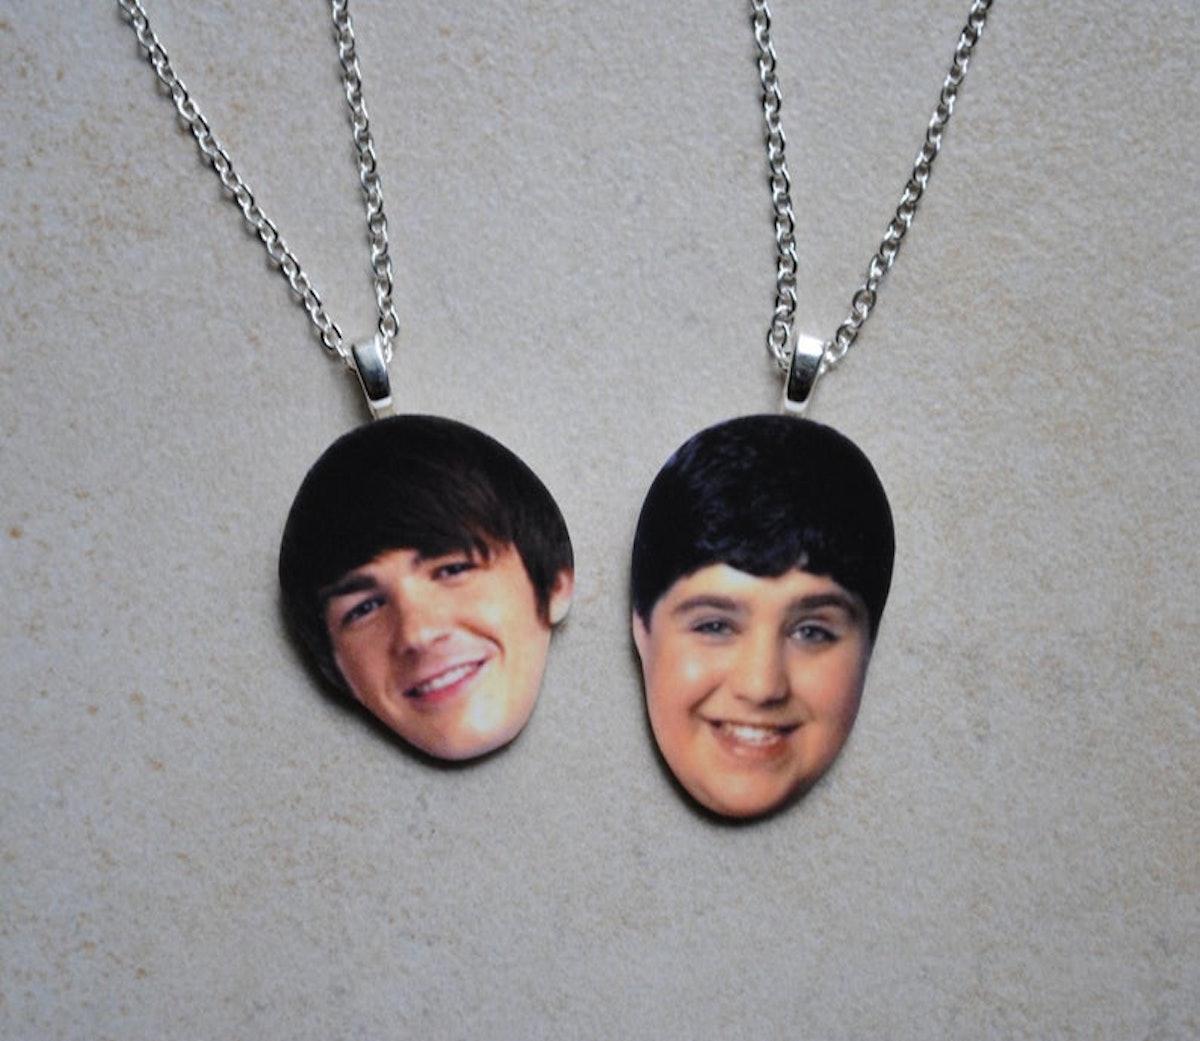 ShopBenji's The Boobs Friendship Necklaces